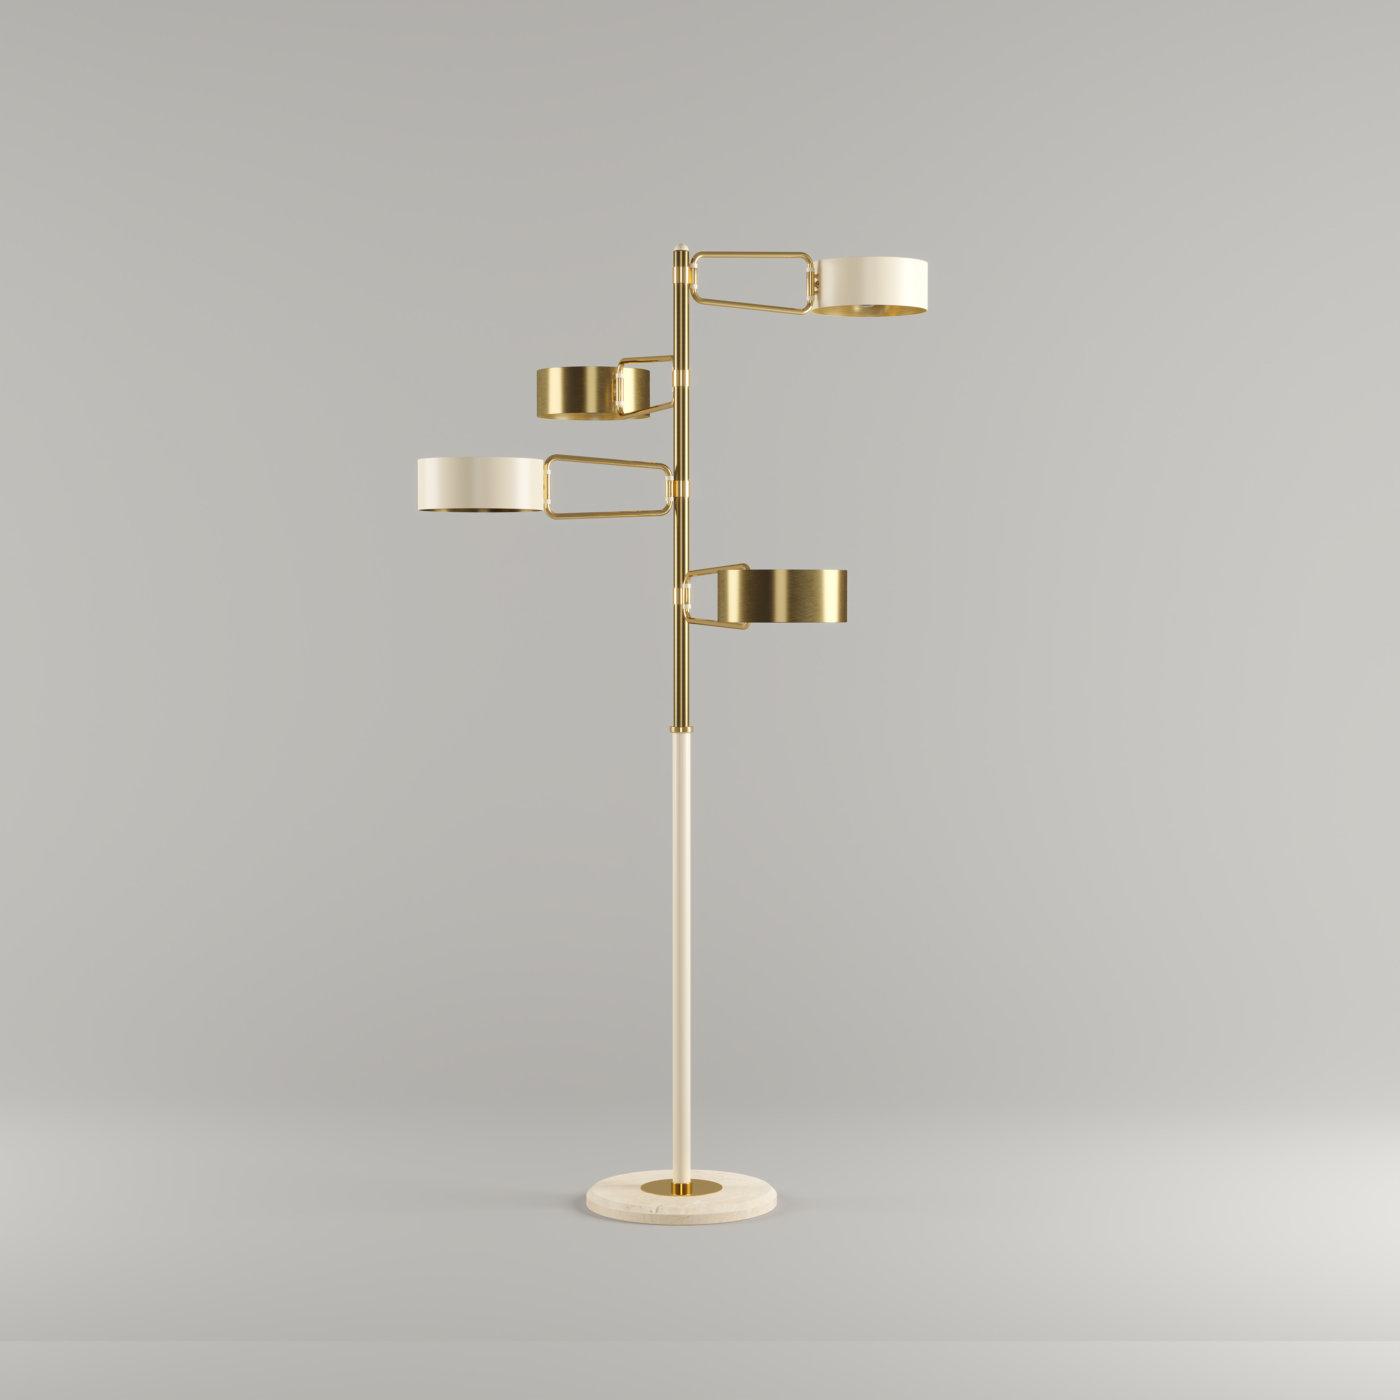 Brompton floor lamp by creativemary